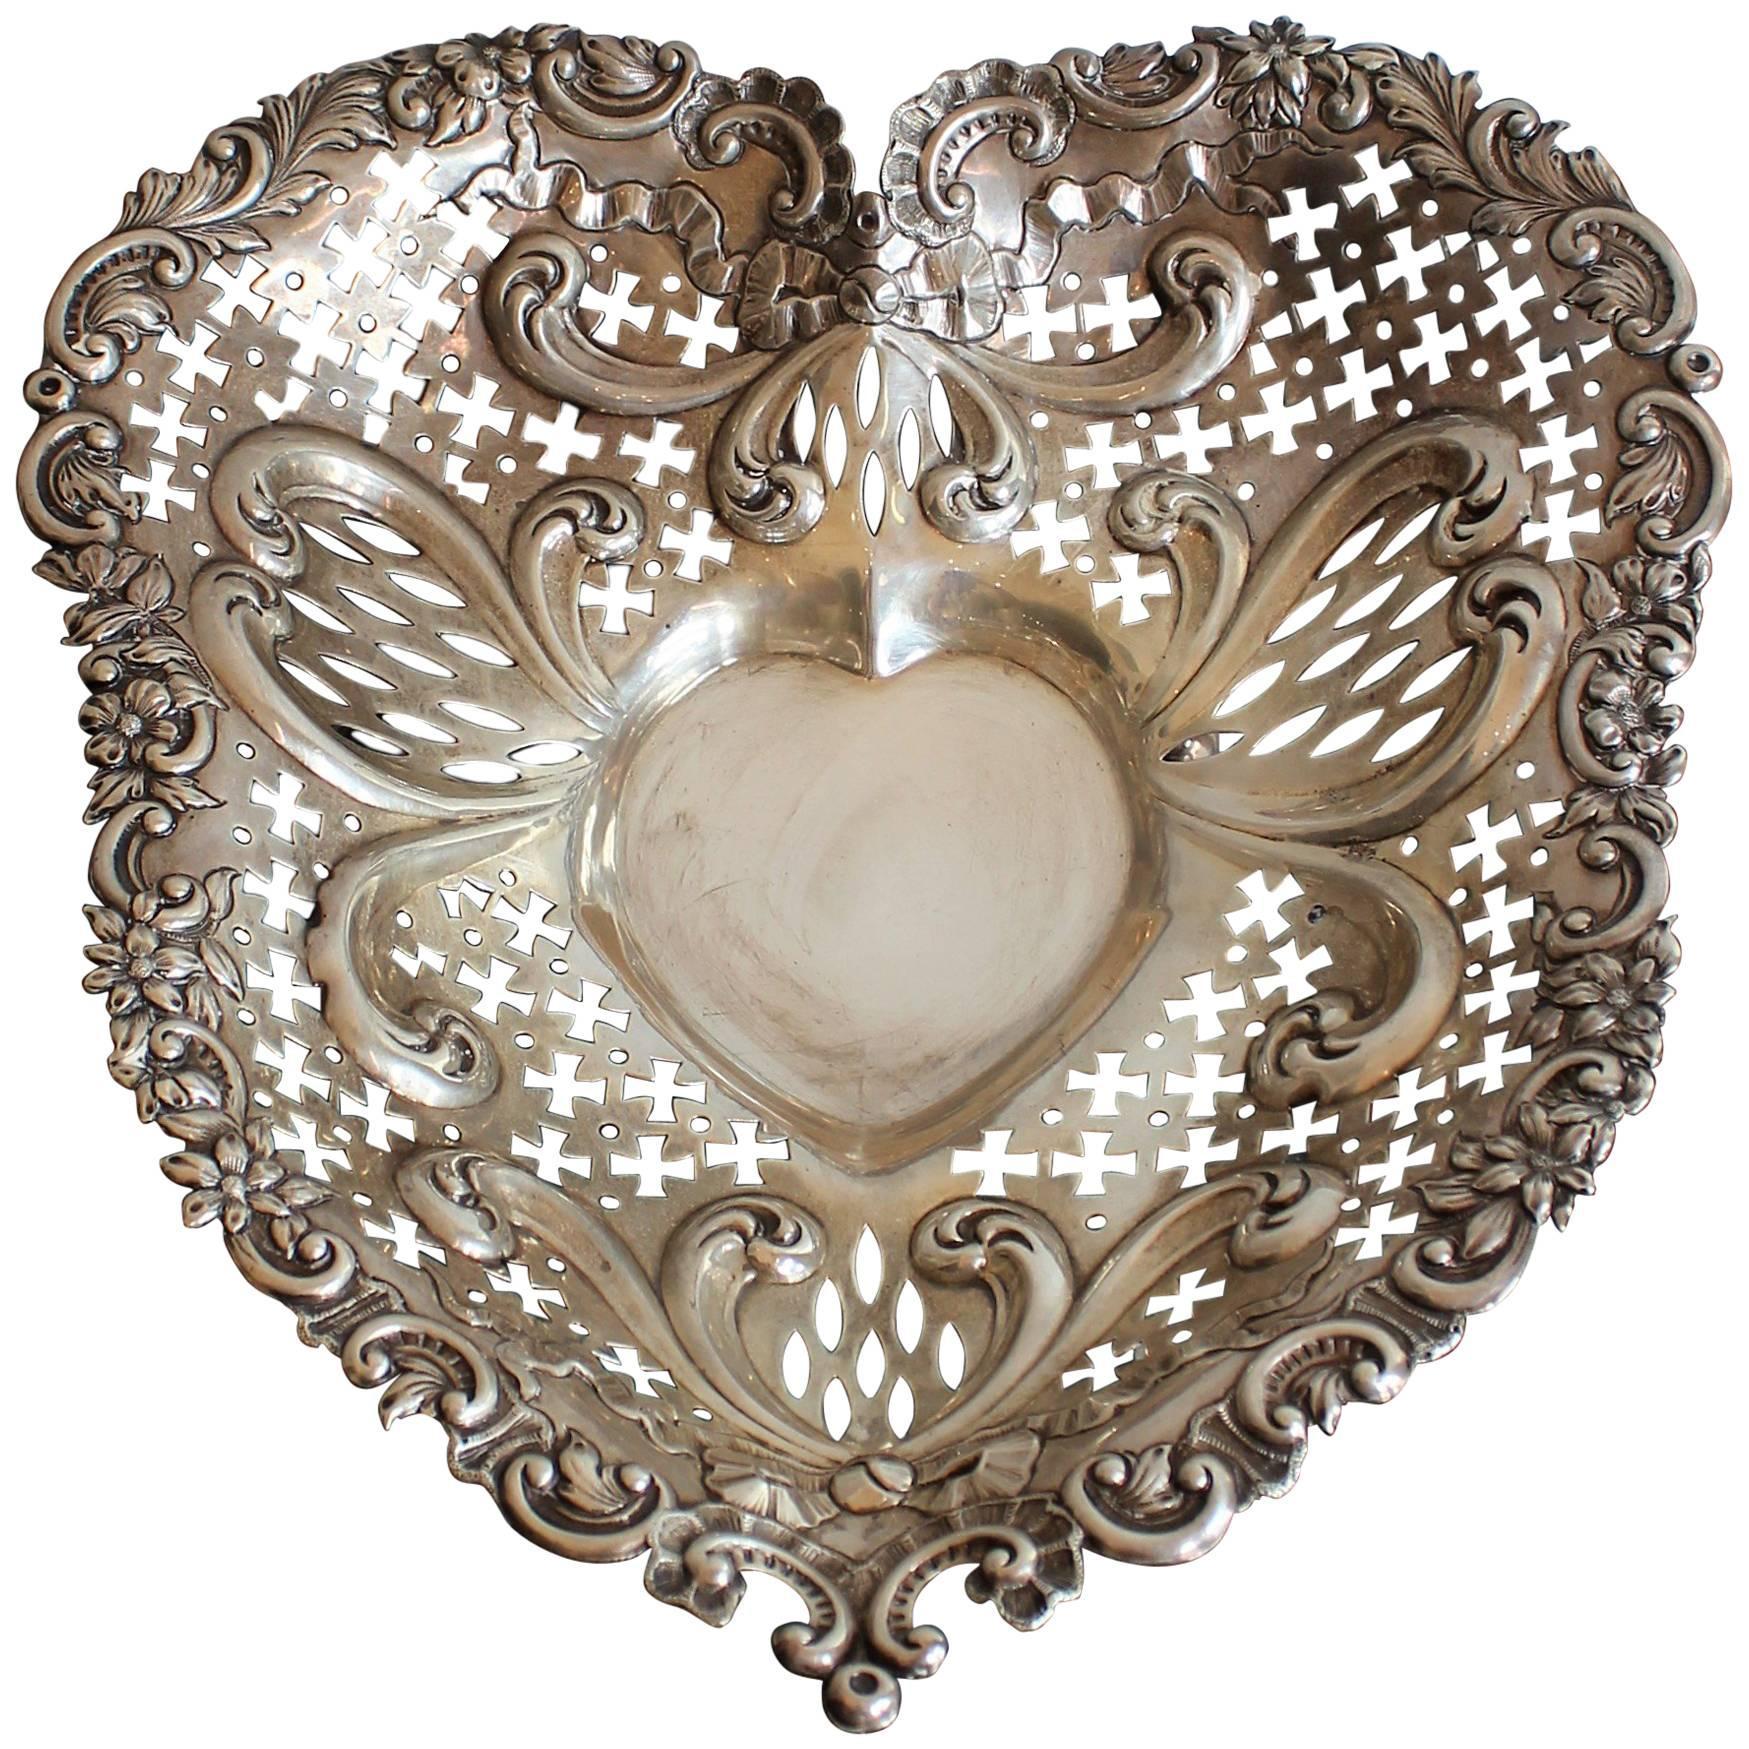 Gorham Pierced Sterling Silver Heart Shaped Basket